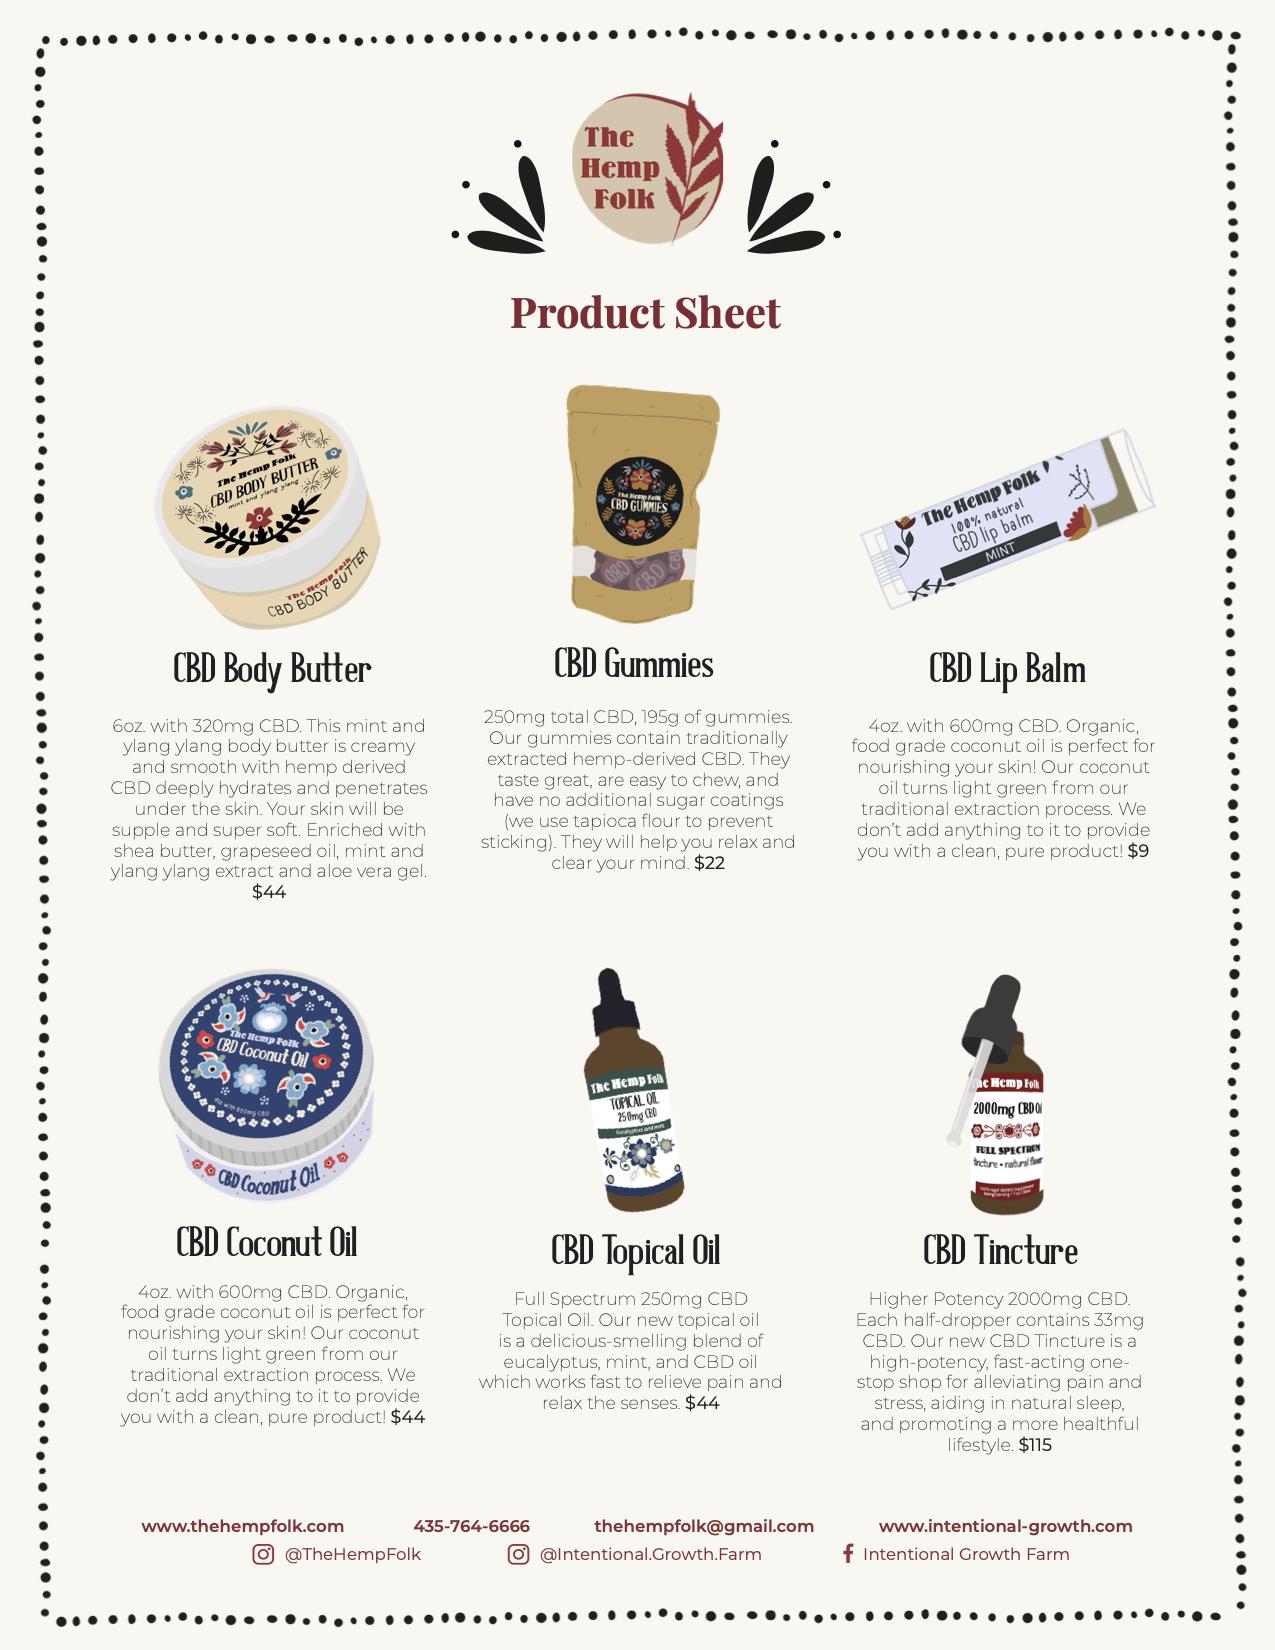 The Hemp Folk Product Sheet 2020